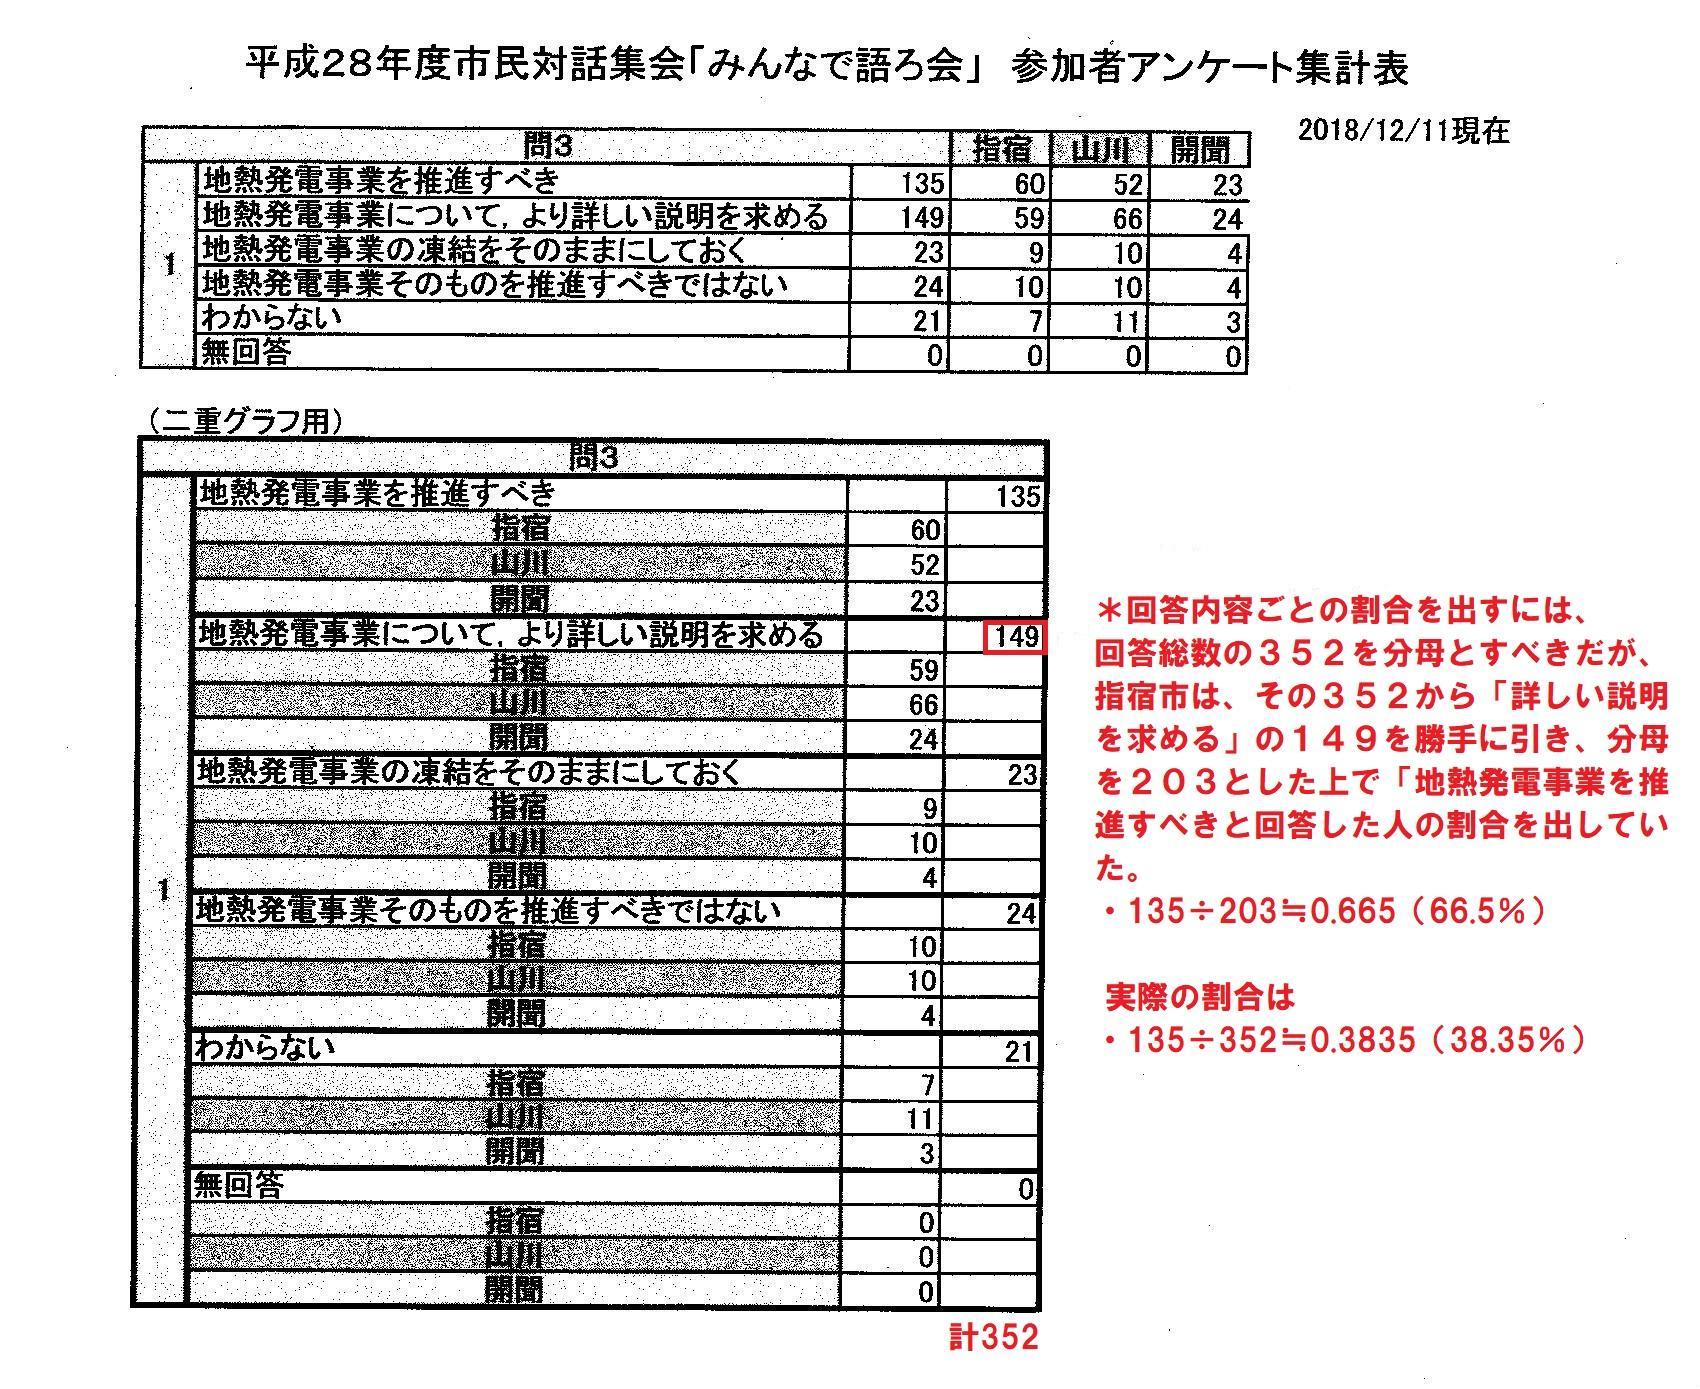 http://hunter-investigate.jp/news/ba327e5417c746e6e7ecb9dfc6458c1d6e984afe.jpg